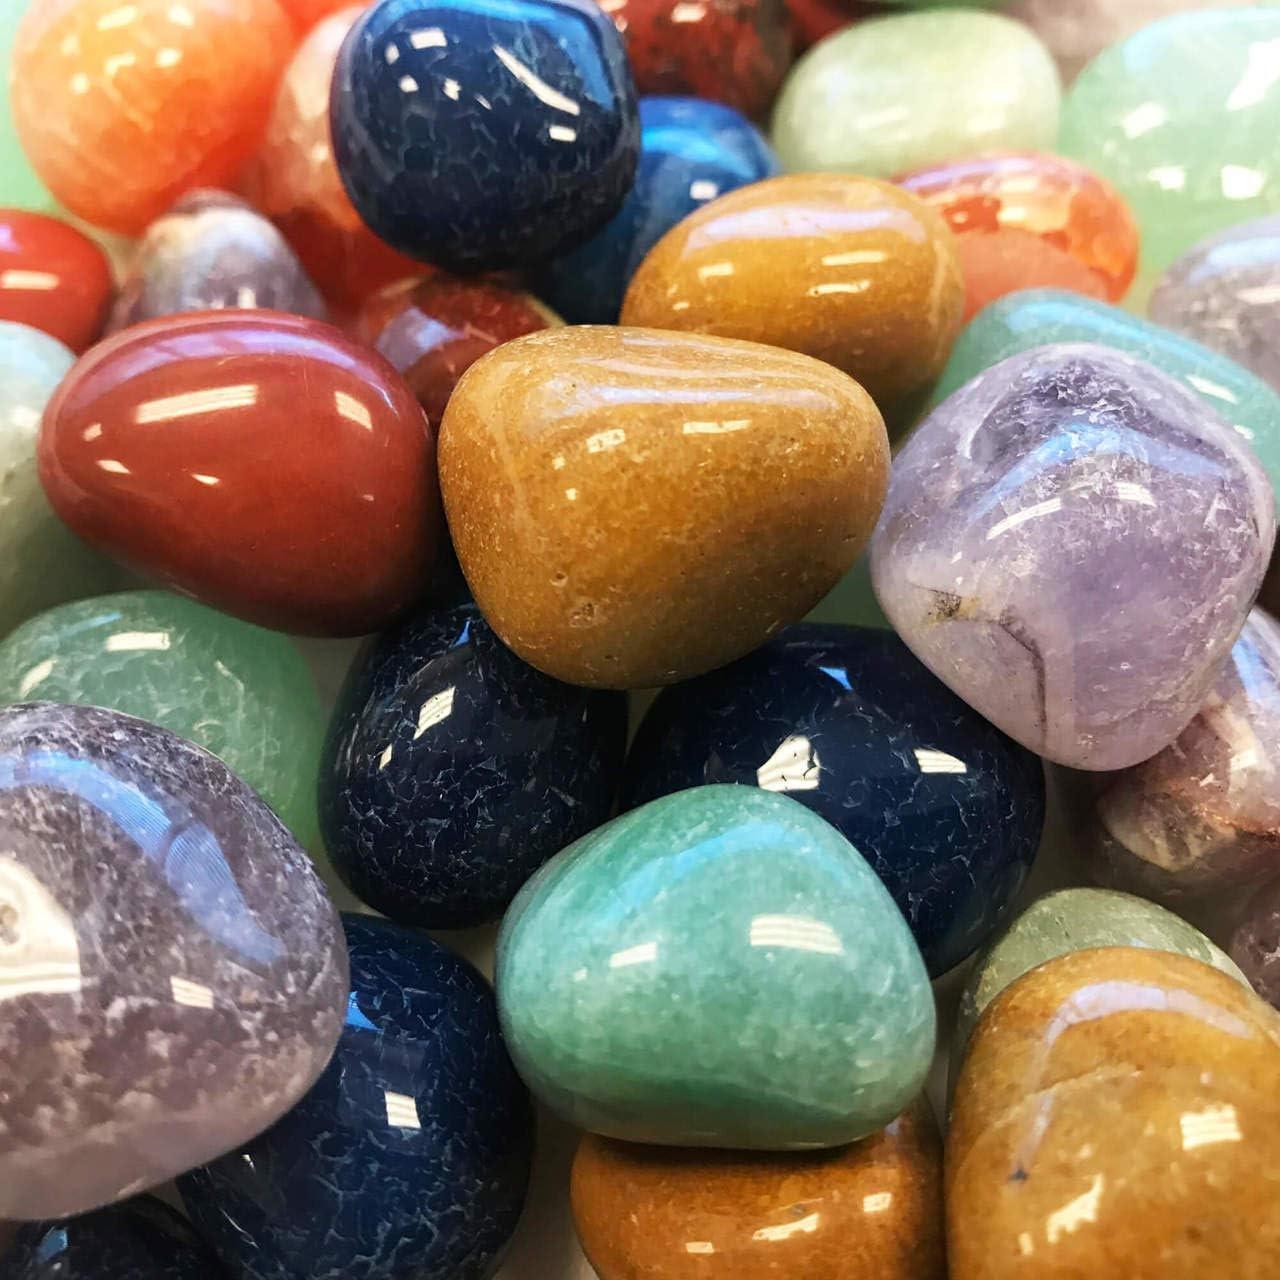 Amethyst WholesaleGemShop Amethyst Crystal Pendulum Stone Healing Quartz 12 Facet Reiki Charged Bead End Free Pouch